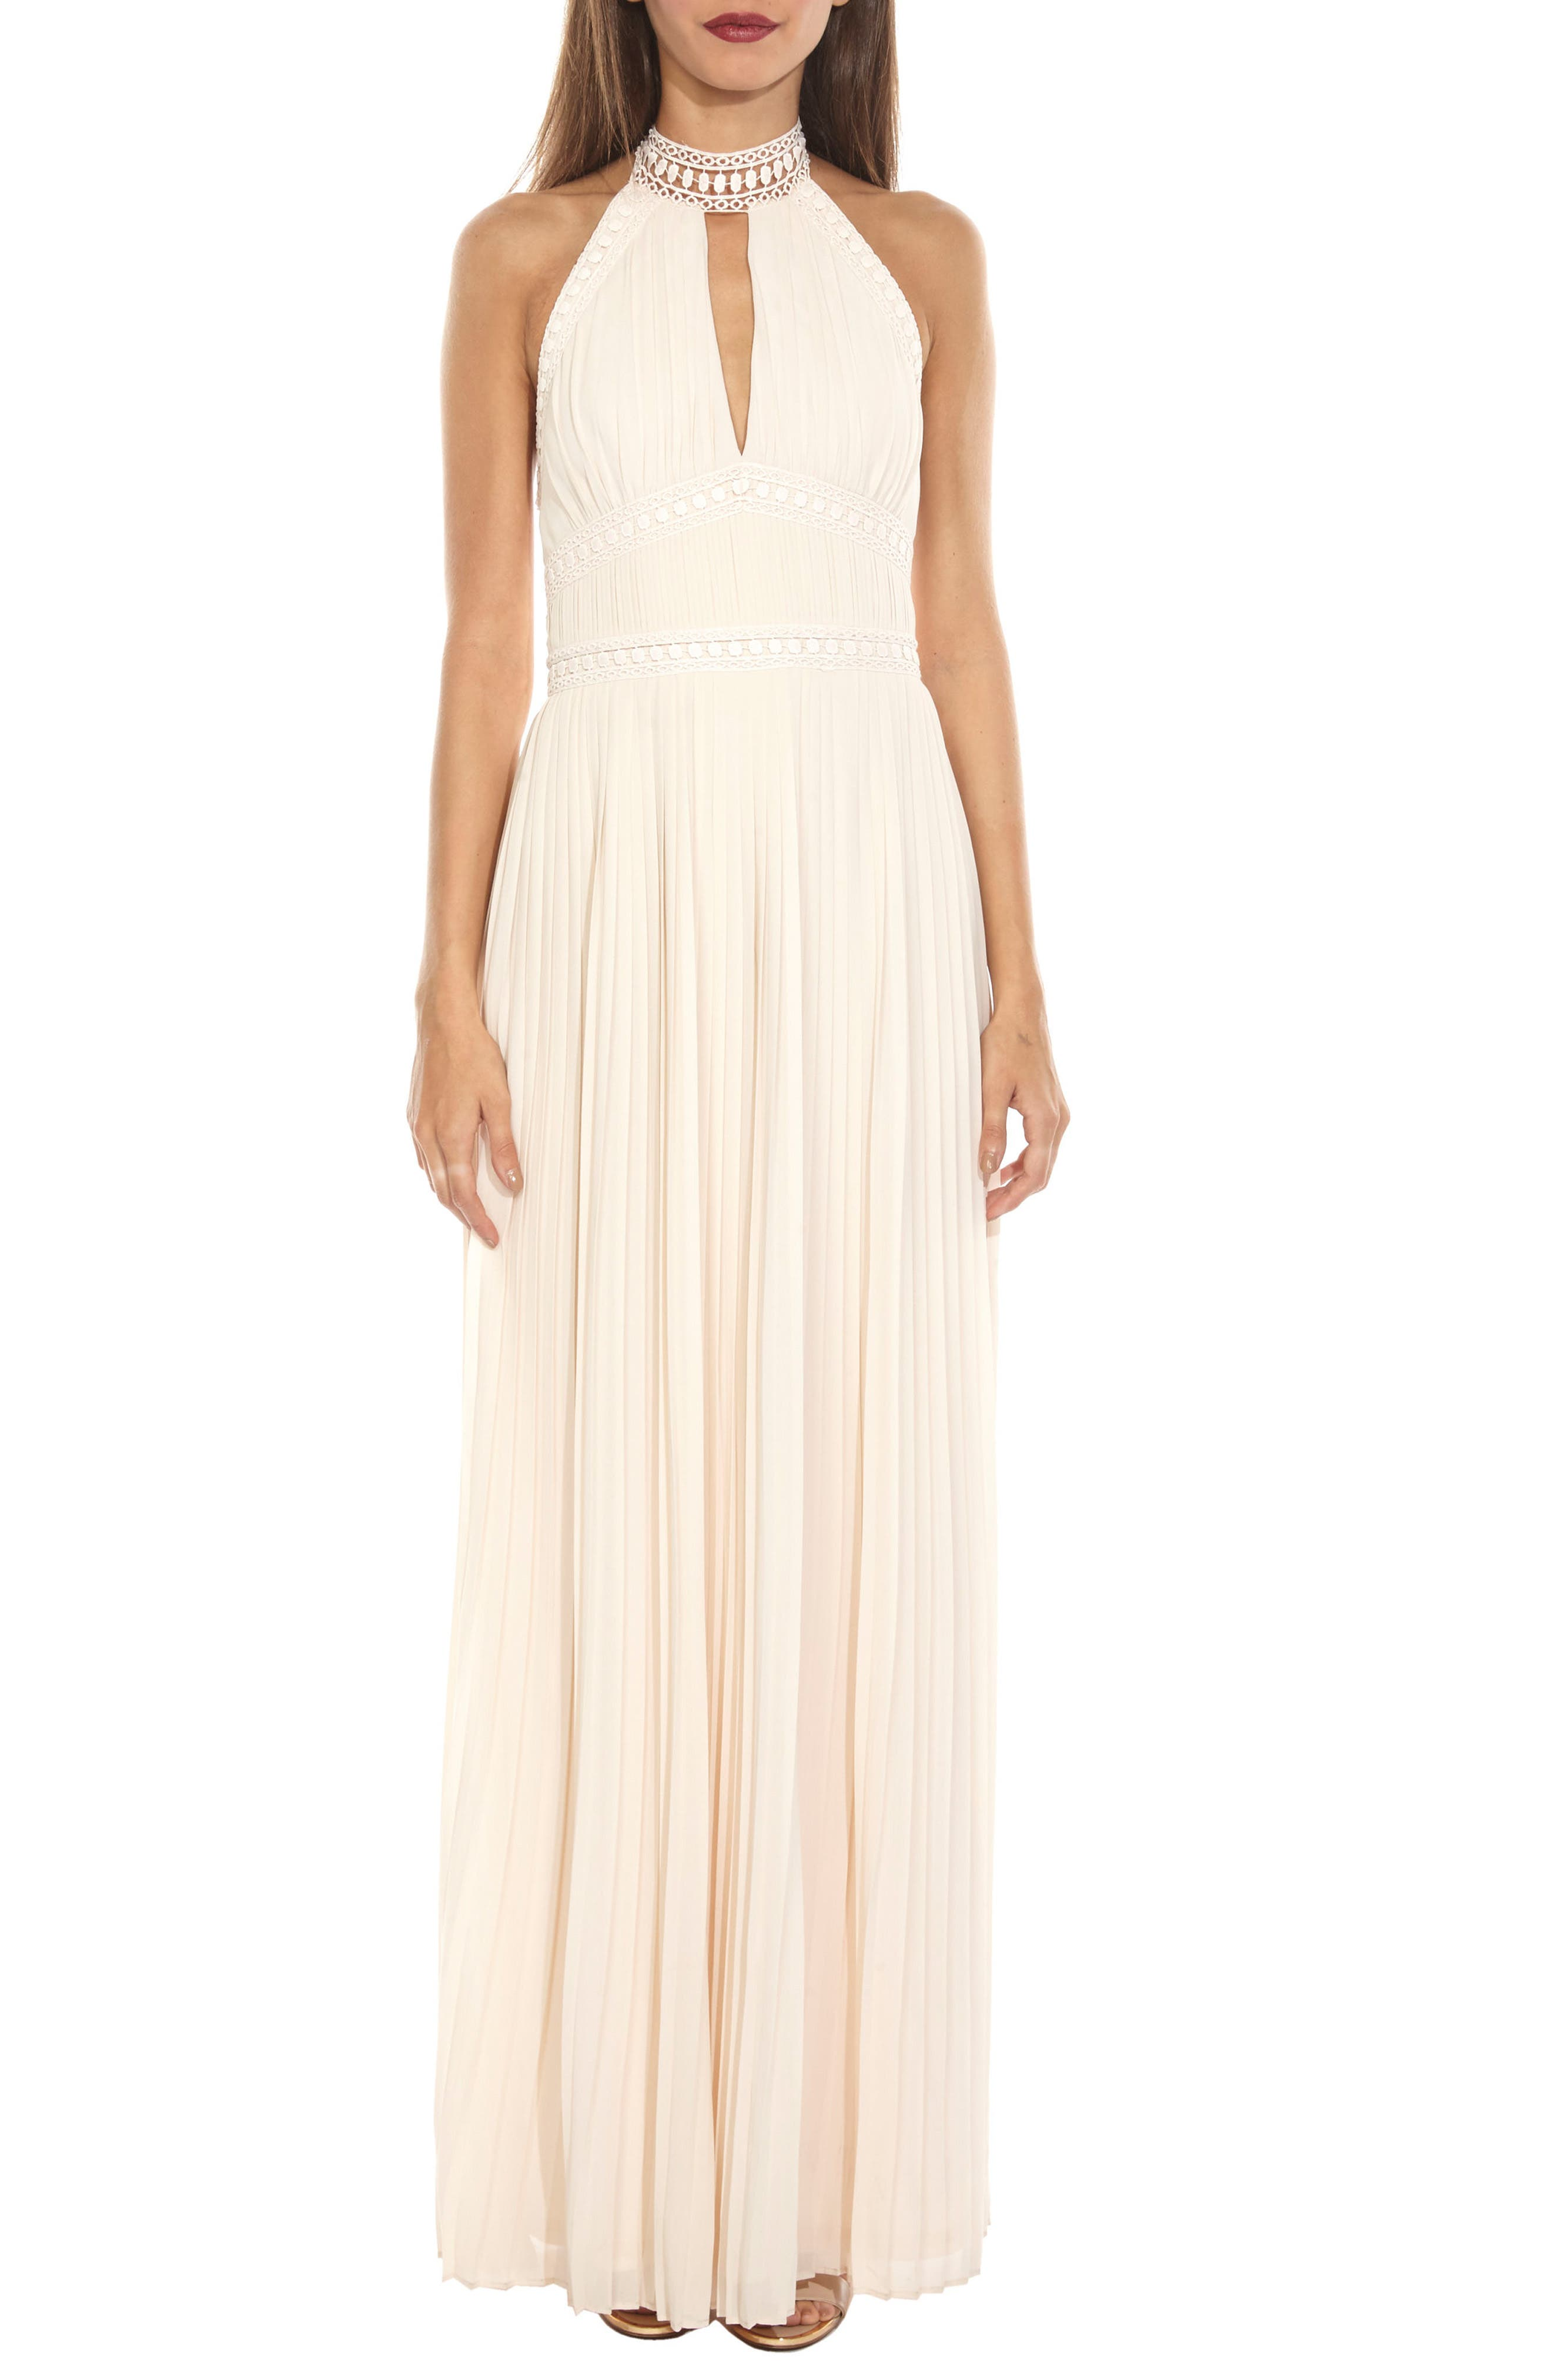 Alternate Image 1 Selected - TFNC Corinne Lace Trim Halter Maxi Dress